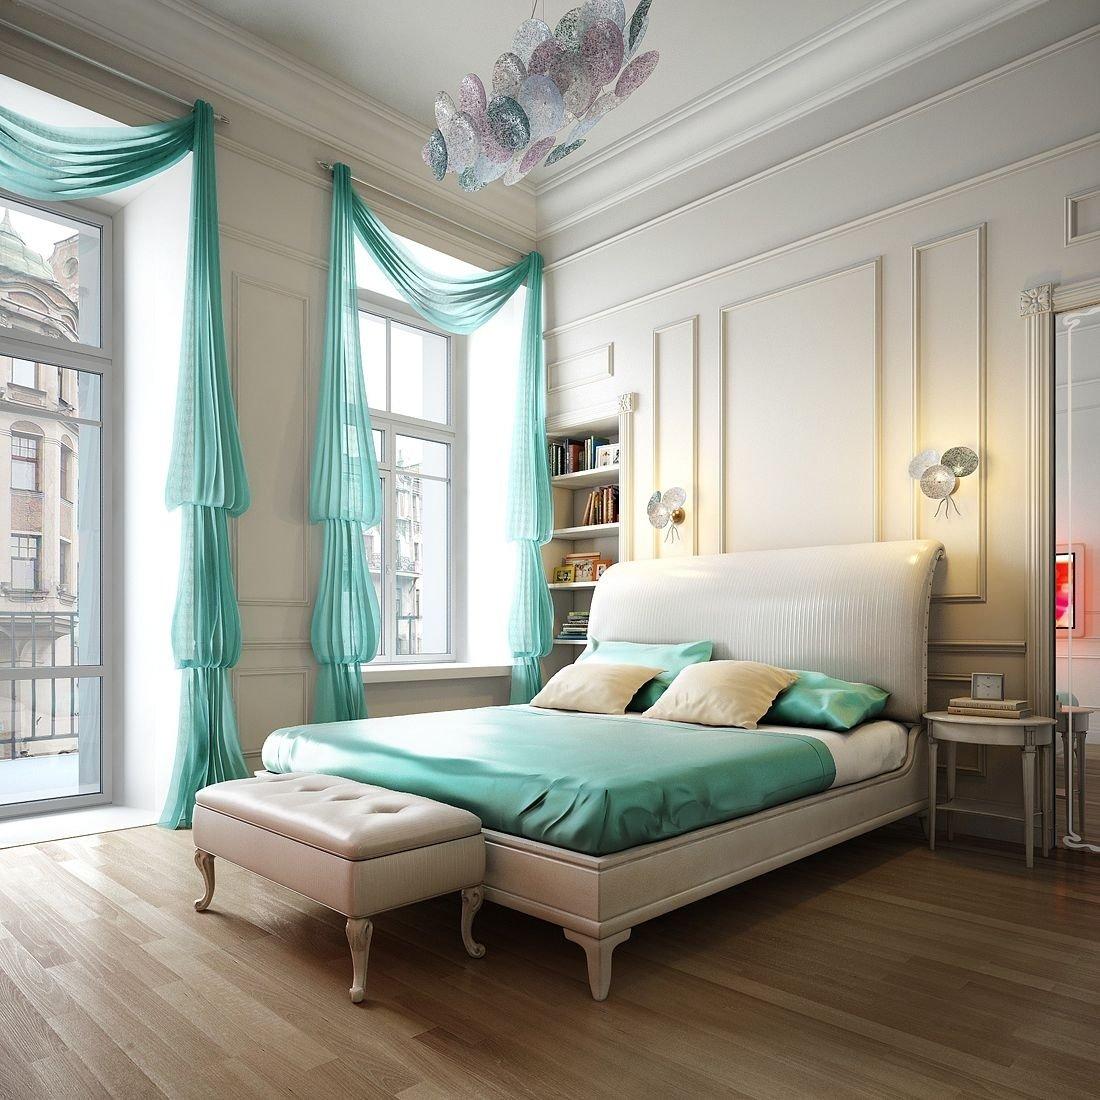 10 Fabulous Master Bedroom Window Treatment Ideas bedroom window treatment ideas decorating charter home ideas